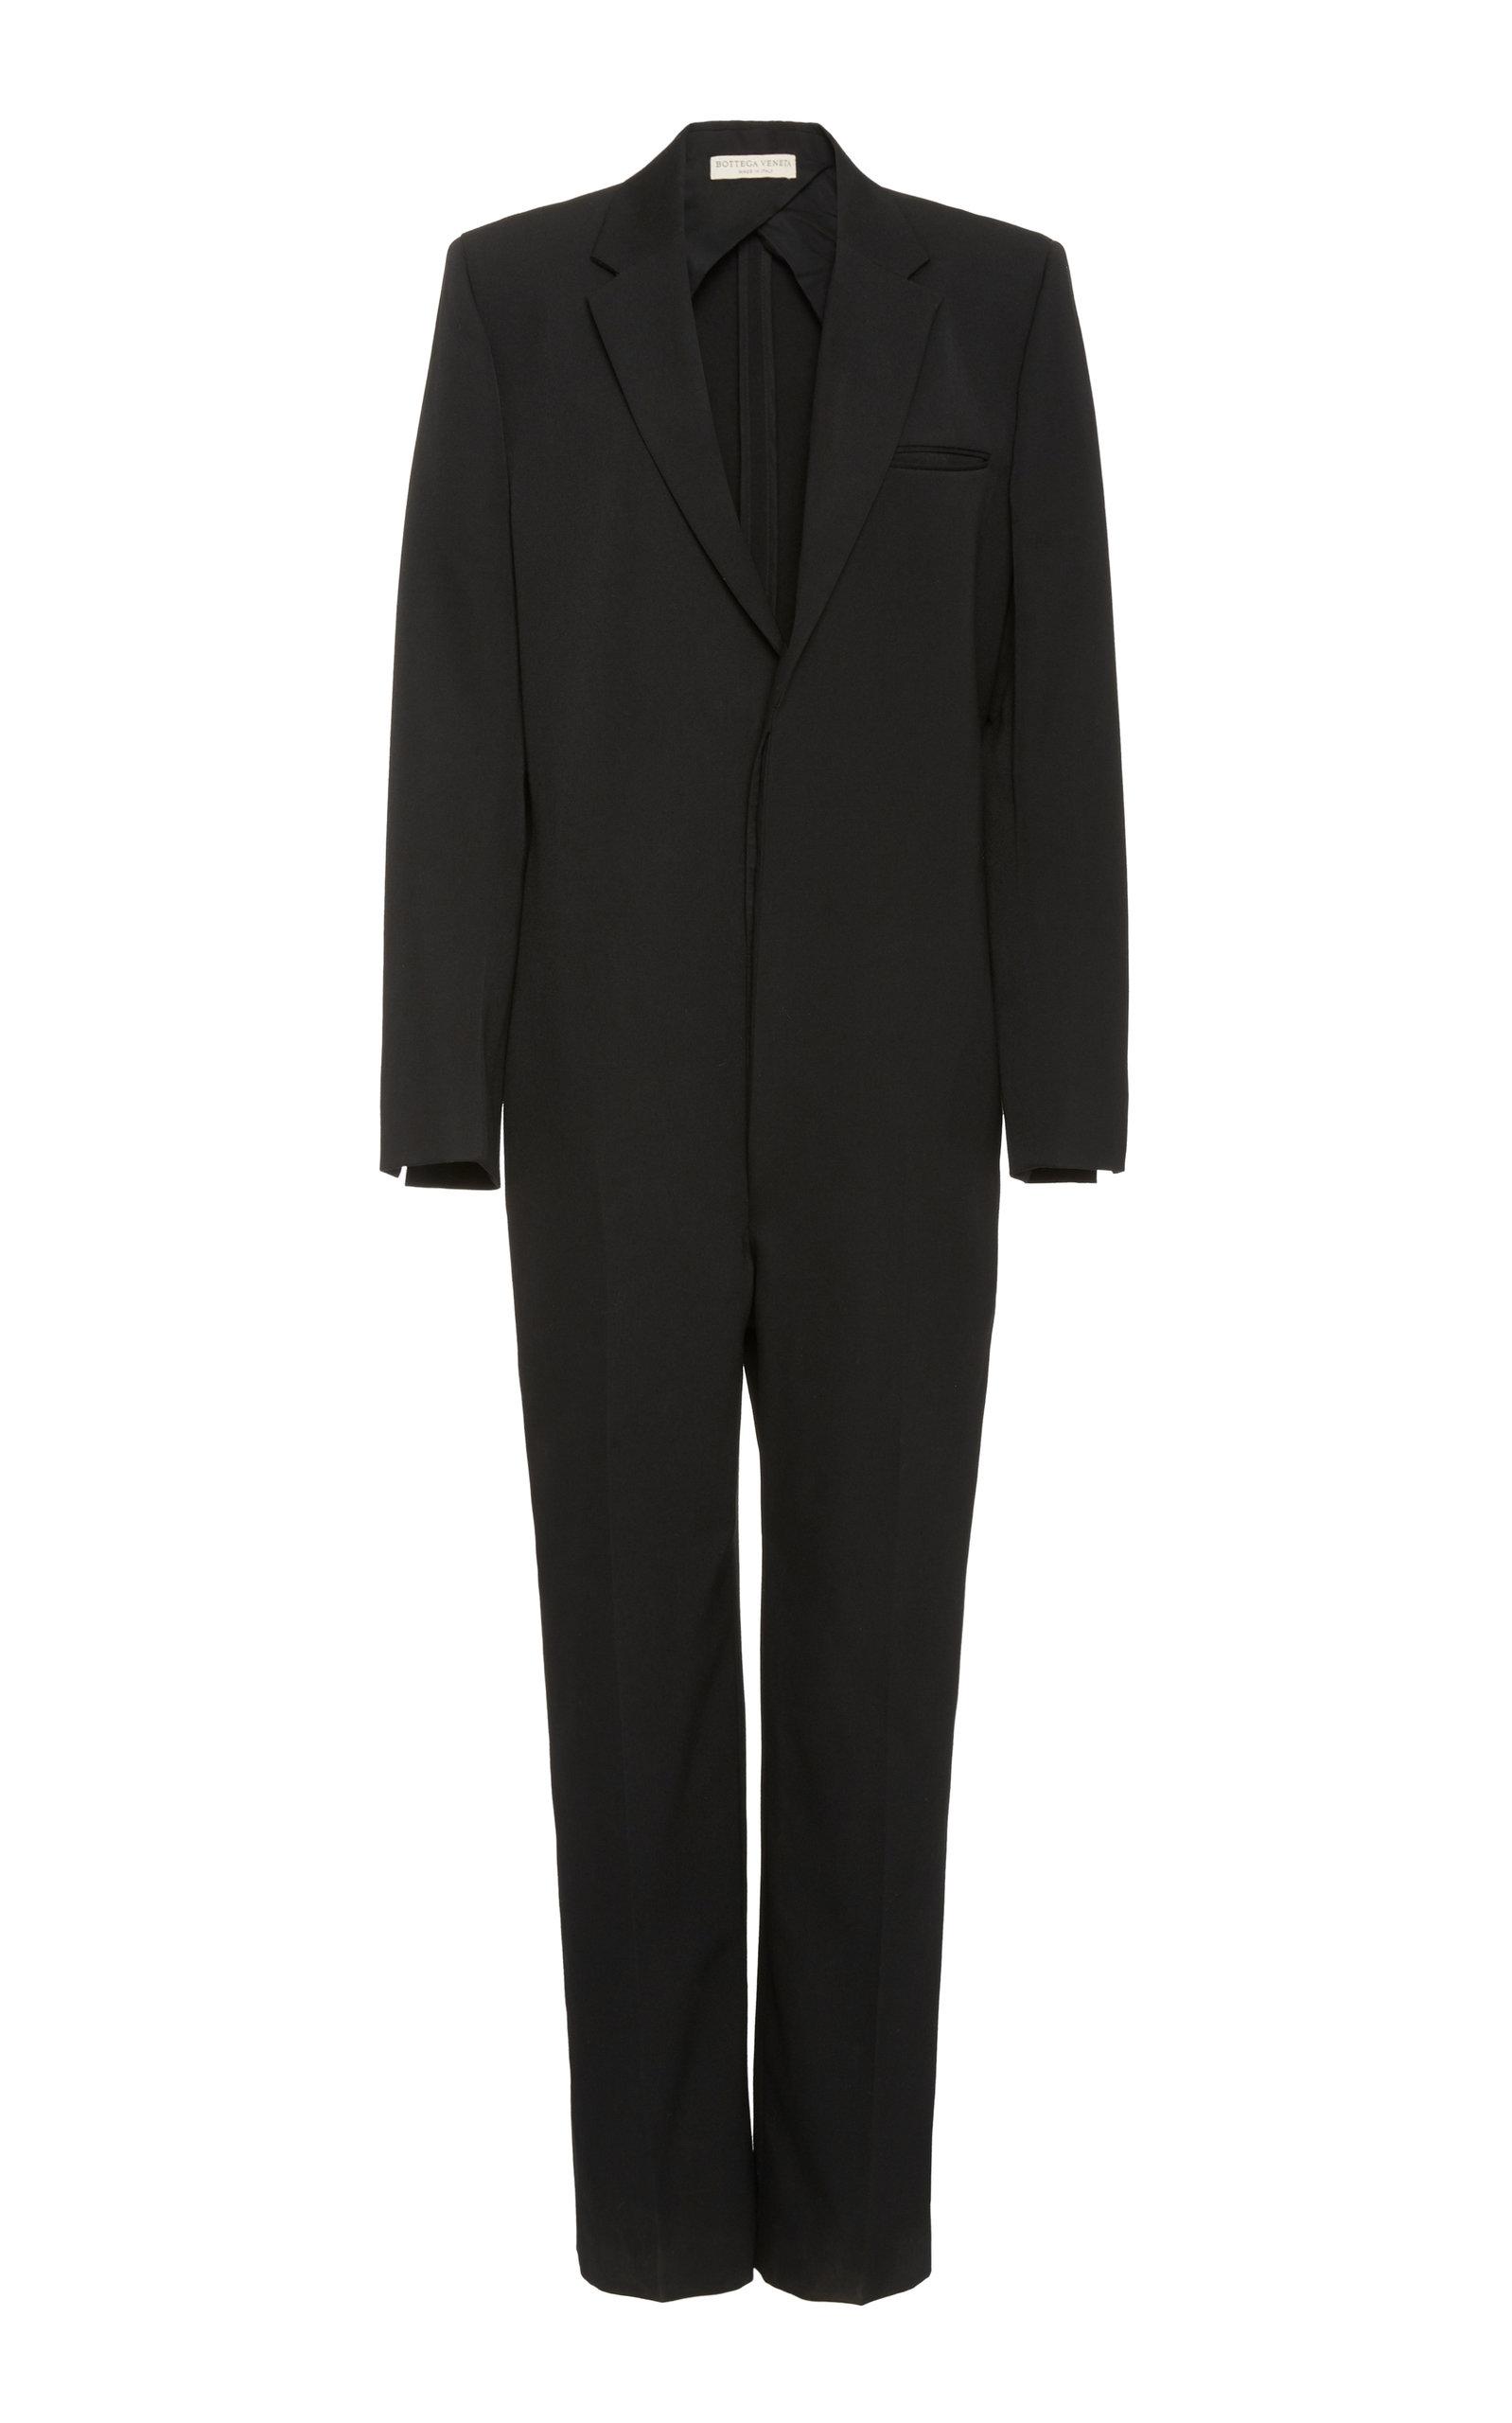 Bottega Veneta - Women's Tailored V-Neck Wool Jumpsuit - Black - Moda Operandi